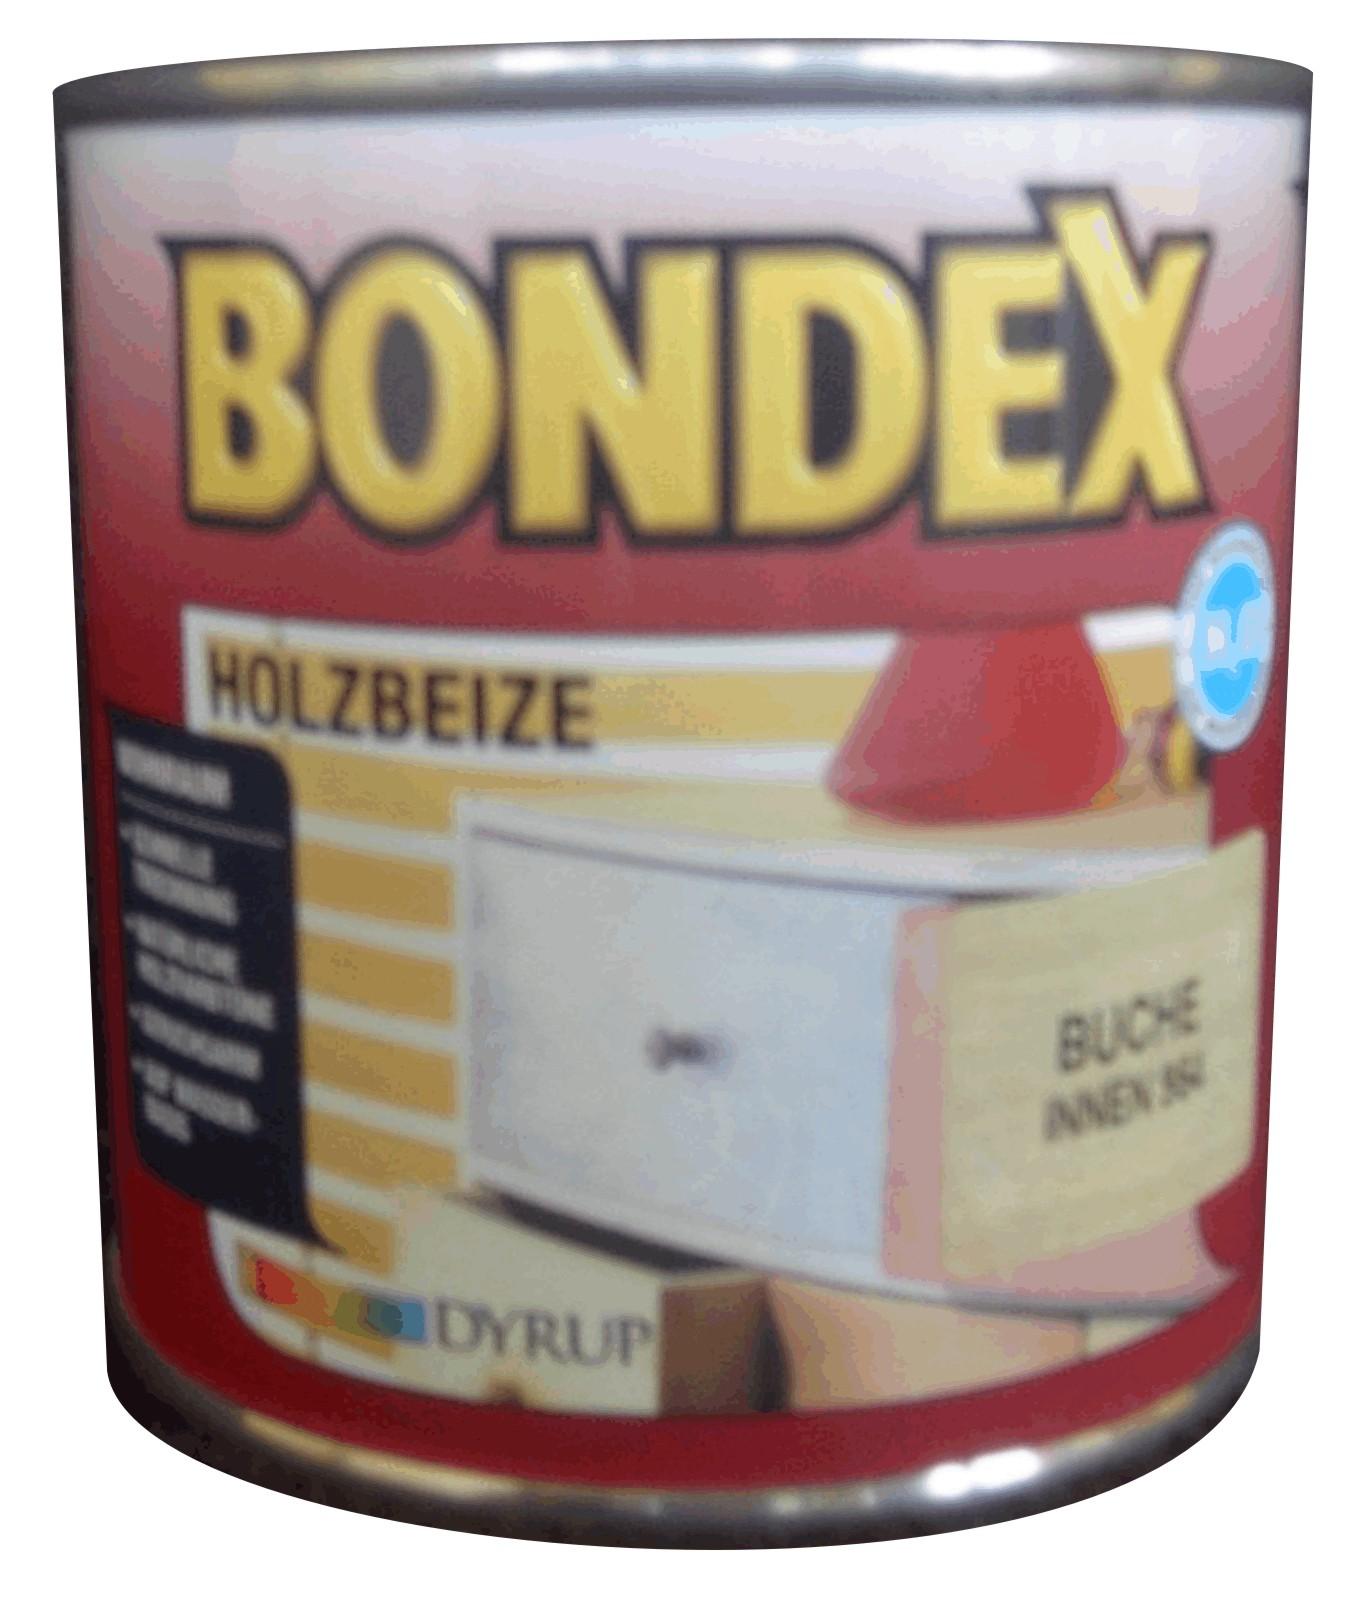 bondex holzbeize 250ml 27 80 l beize auf wasserbasis. Black Bedroom Furniture Sets. Home Design Ideas